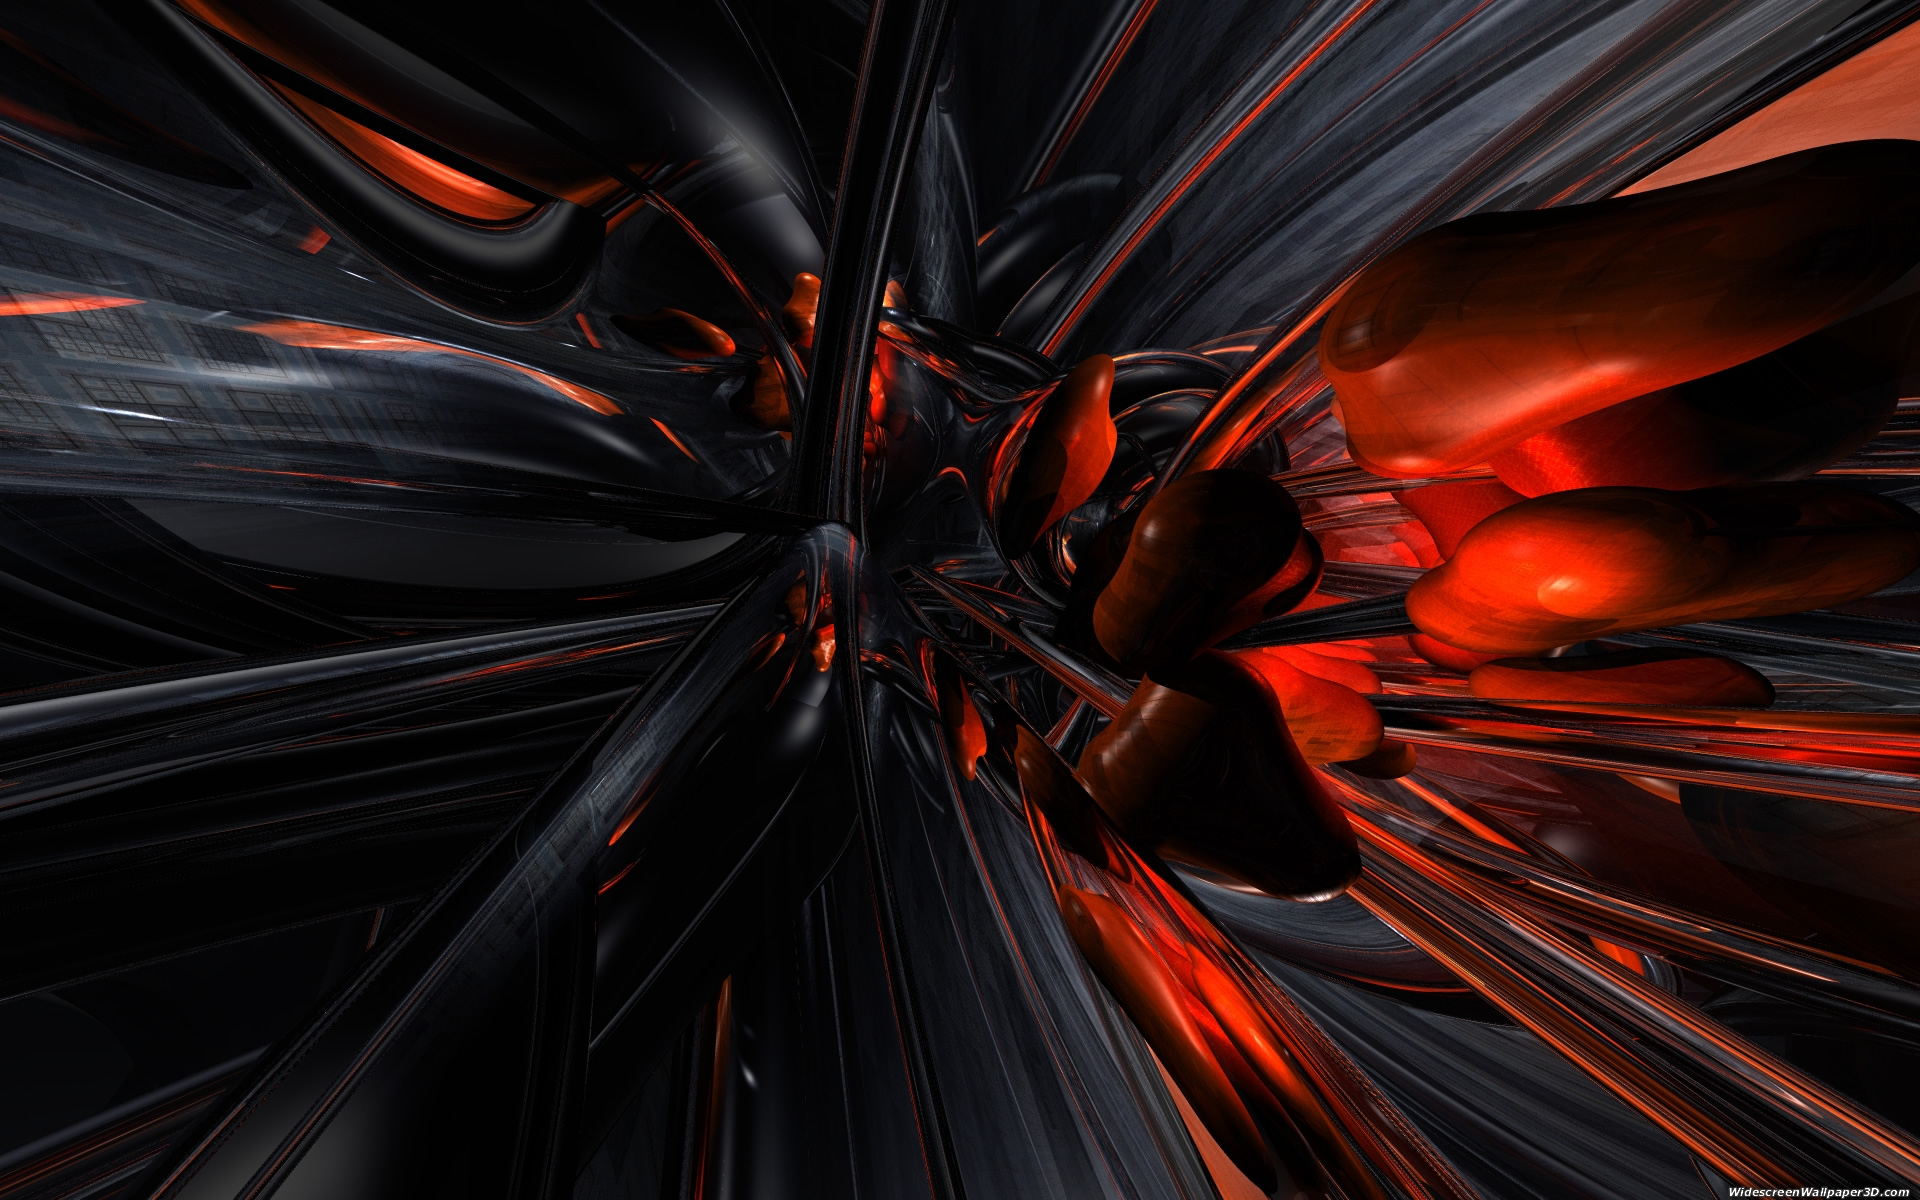 fractal cool widescreen image